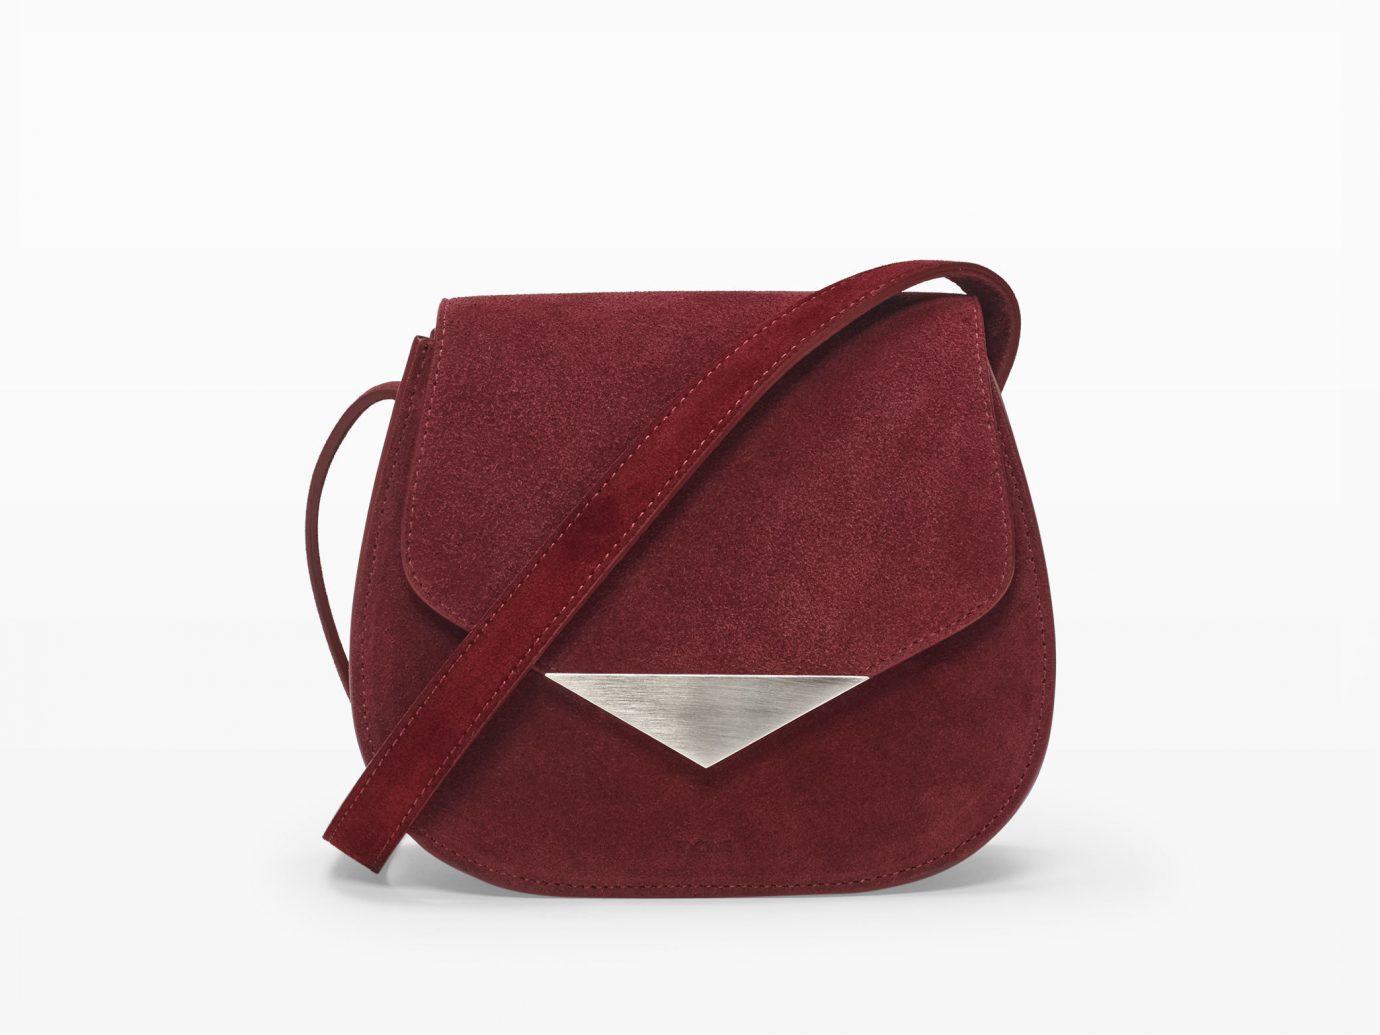 Style + Design bag handbag red maroon brown shoulder bag leather magenta fashion accessory textile messenger bag accessory